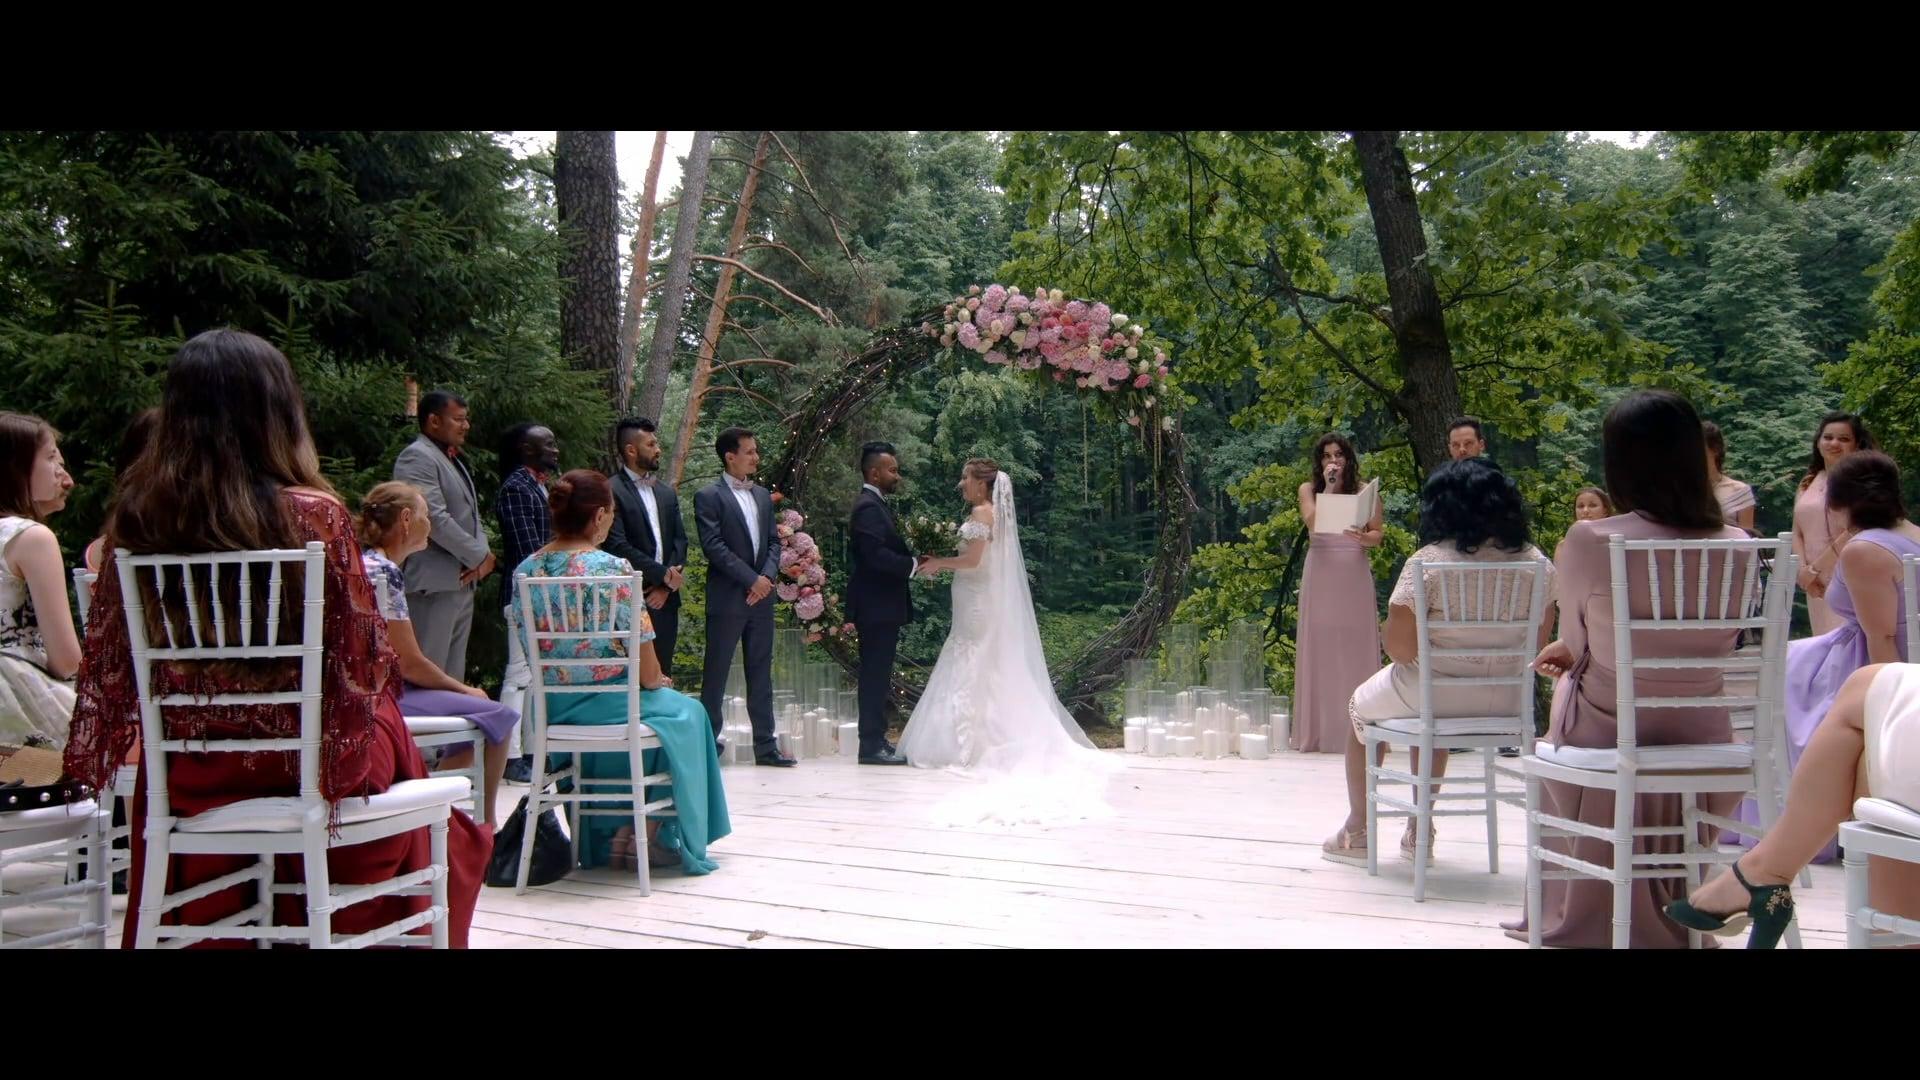 Alexander Ismailov bilingual hosting. Nabil and Ksenia wedding.